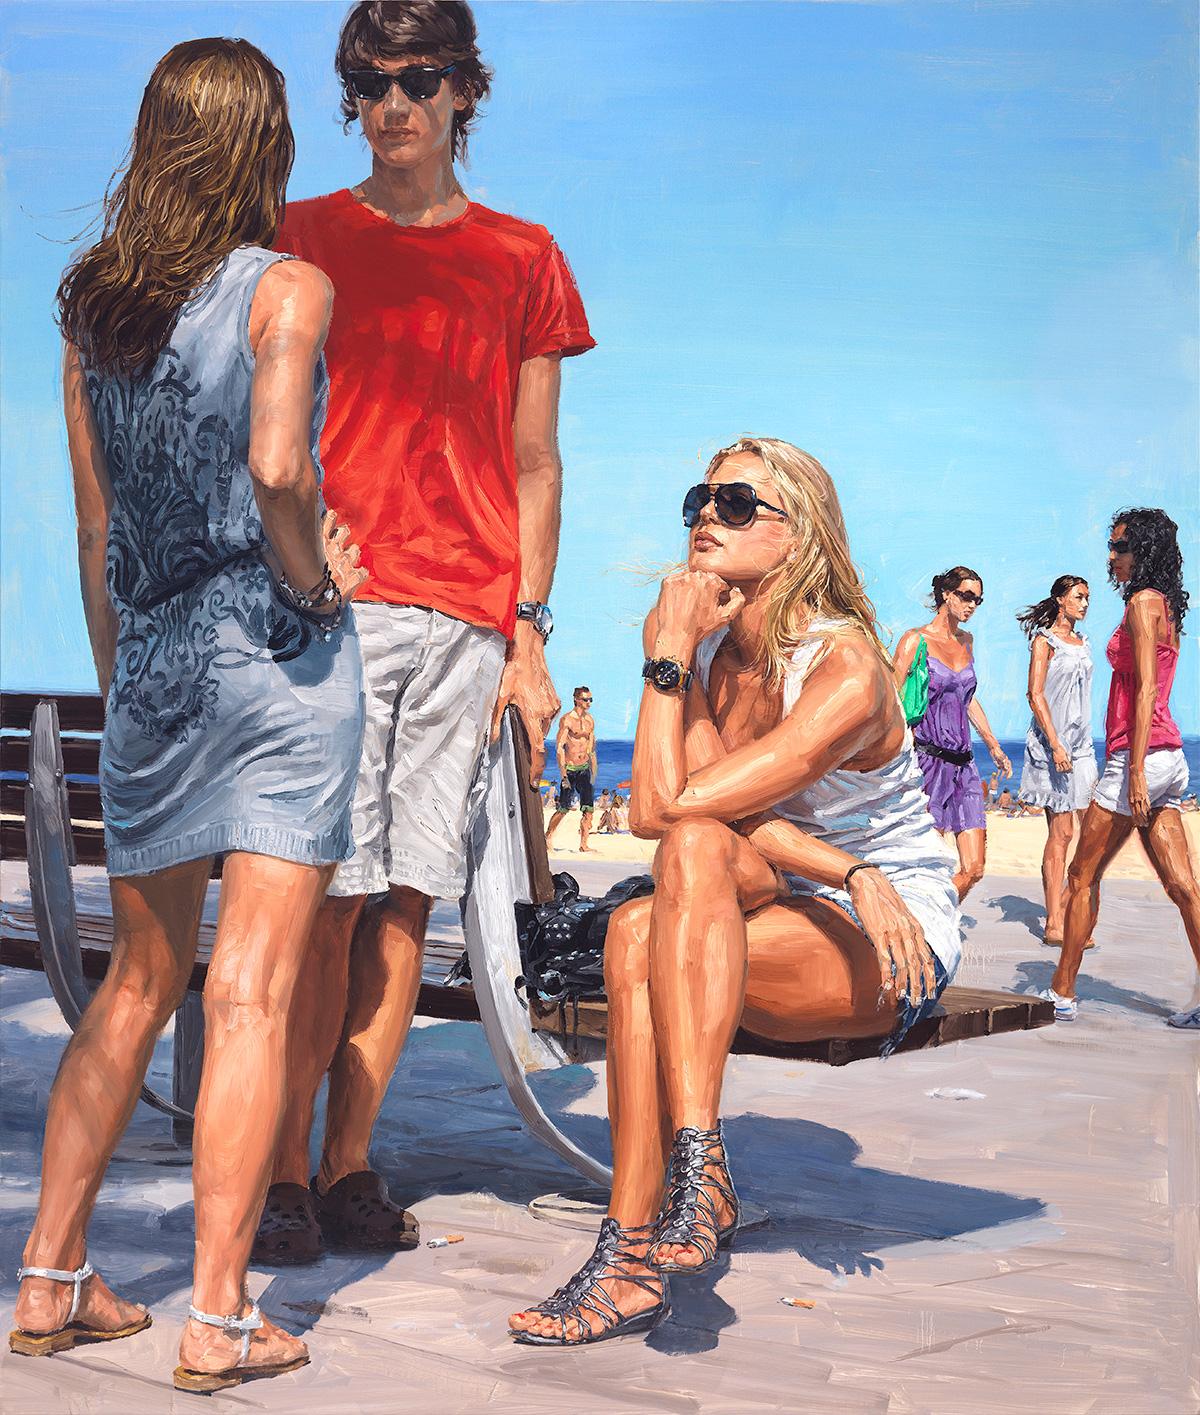 The Other Girl, 2010, oil on linen, 200x170cm